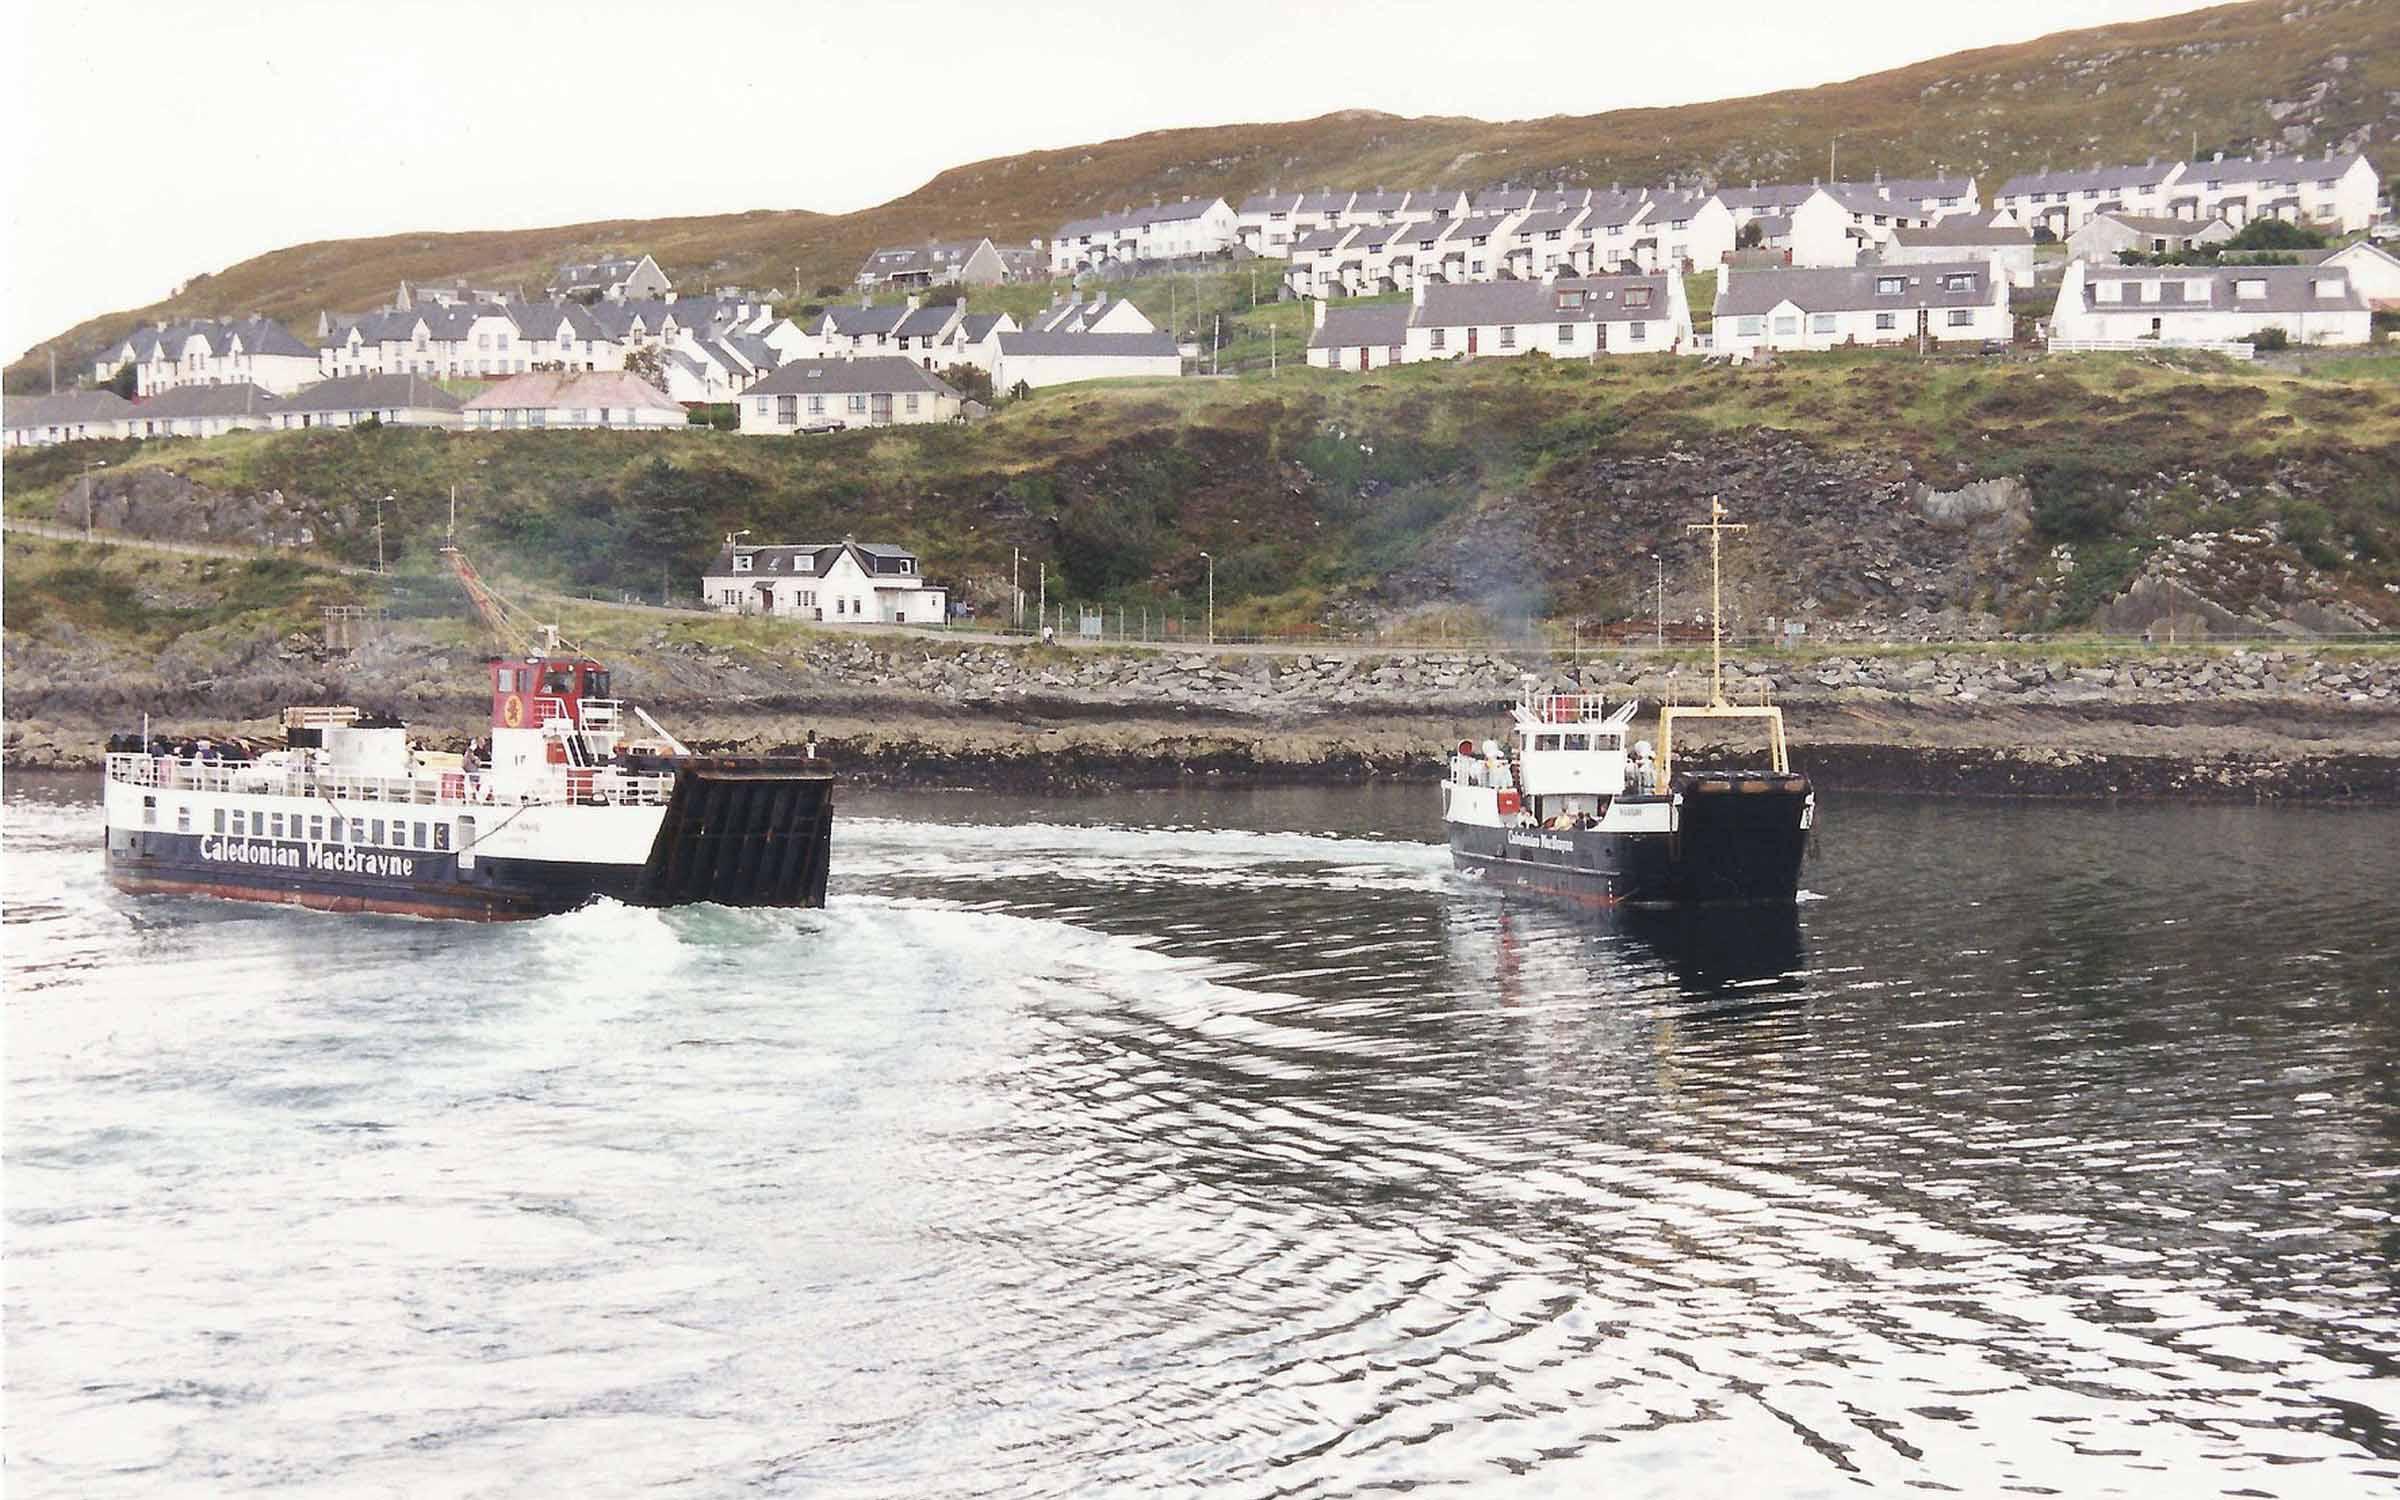 Loch Linnhe and Raasay at Mallaig (Iain McPherson)